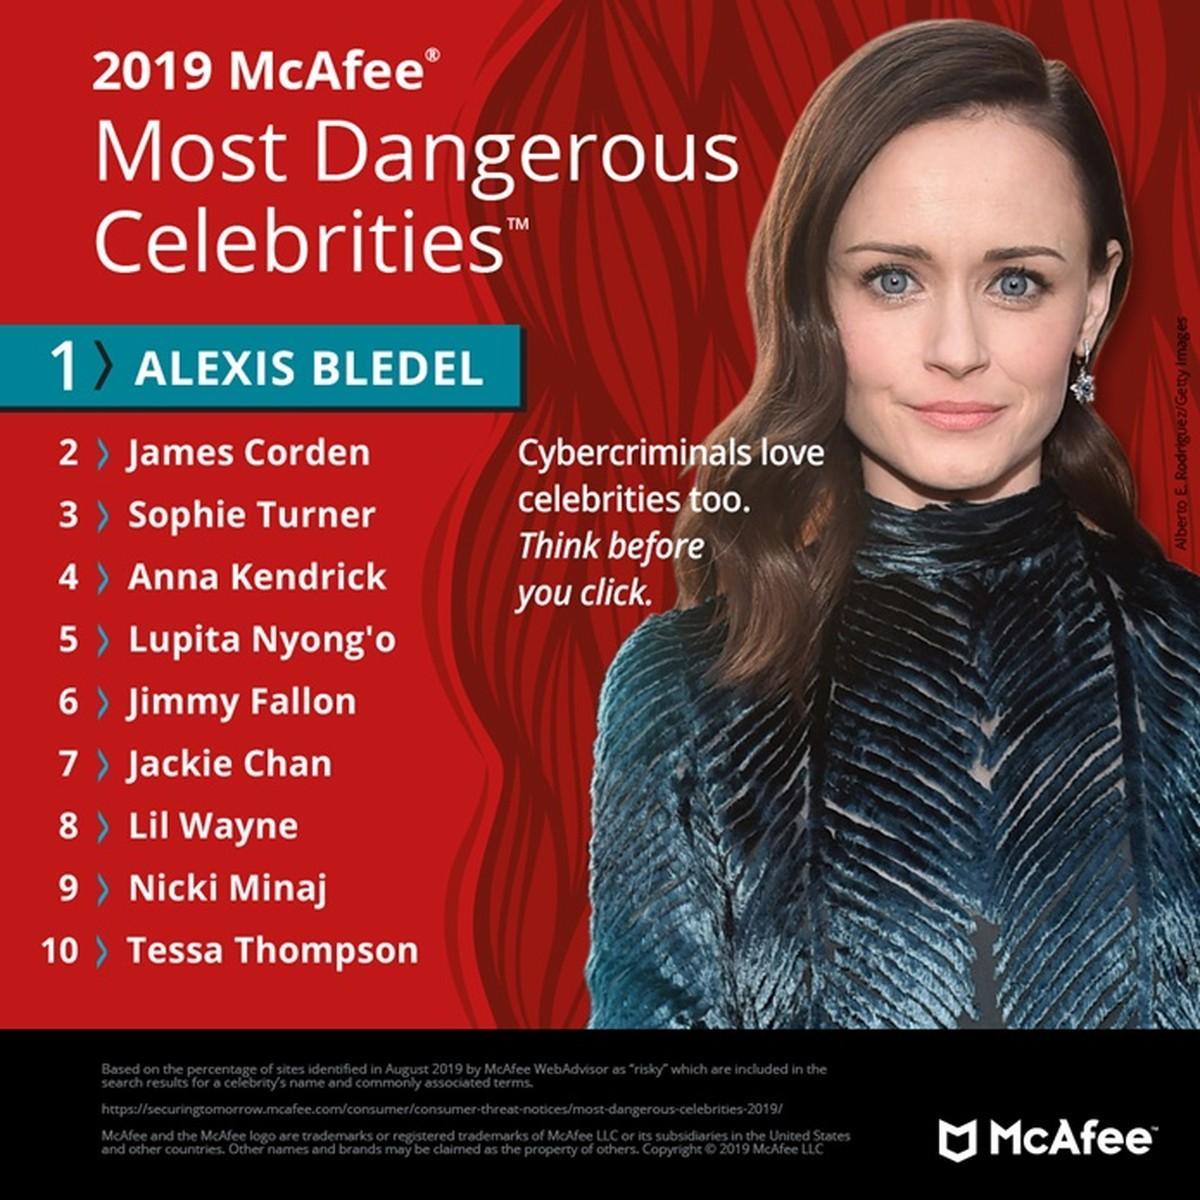 Alexis Bledel adalah selebriti paling berbahaya di Internet;  lihat peringkat